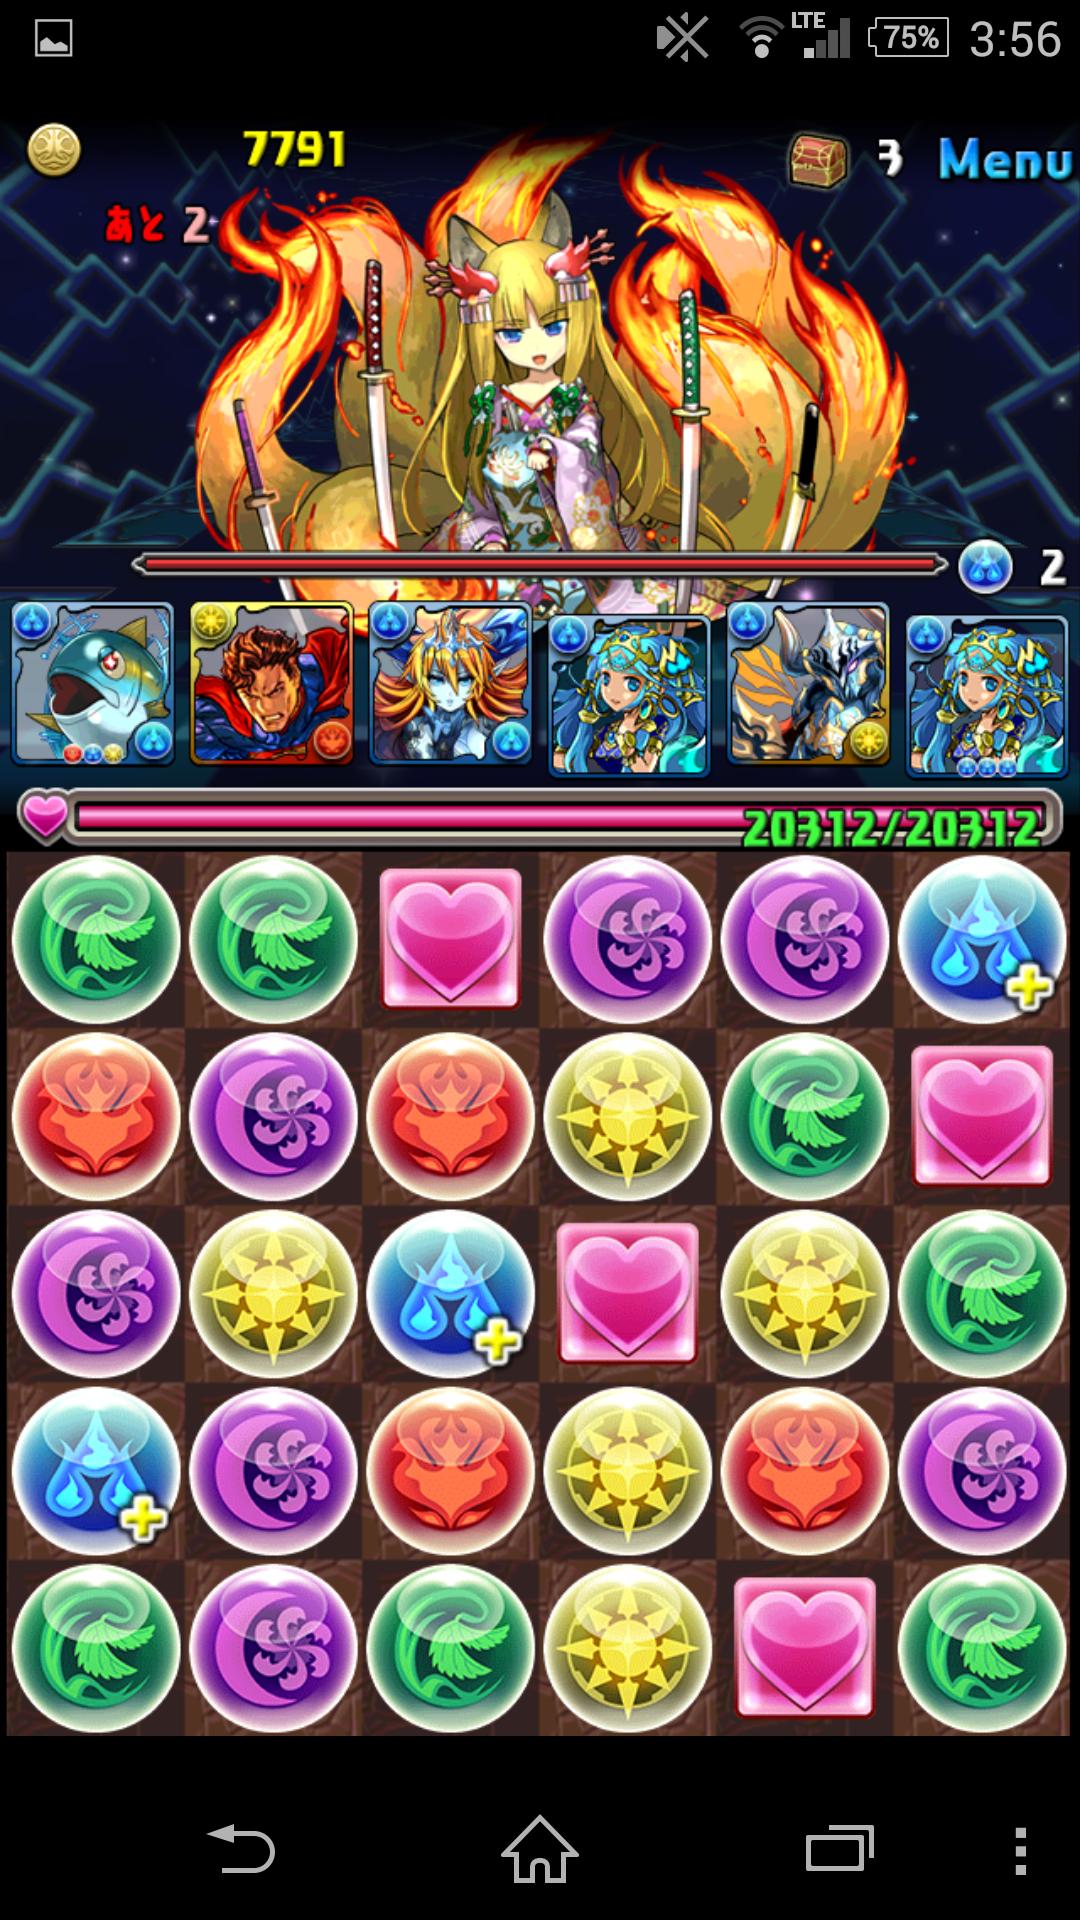 Screenshot_2014-12-16-03-56-10.png